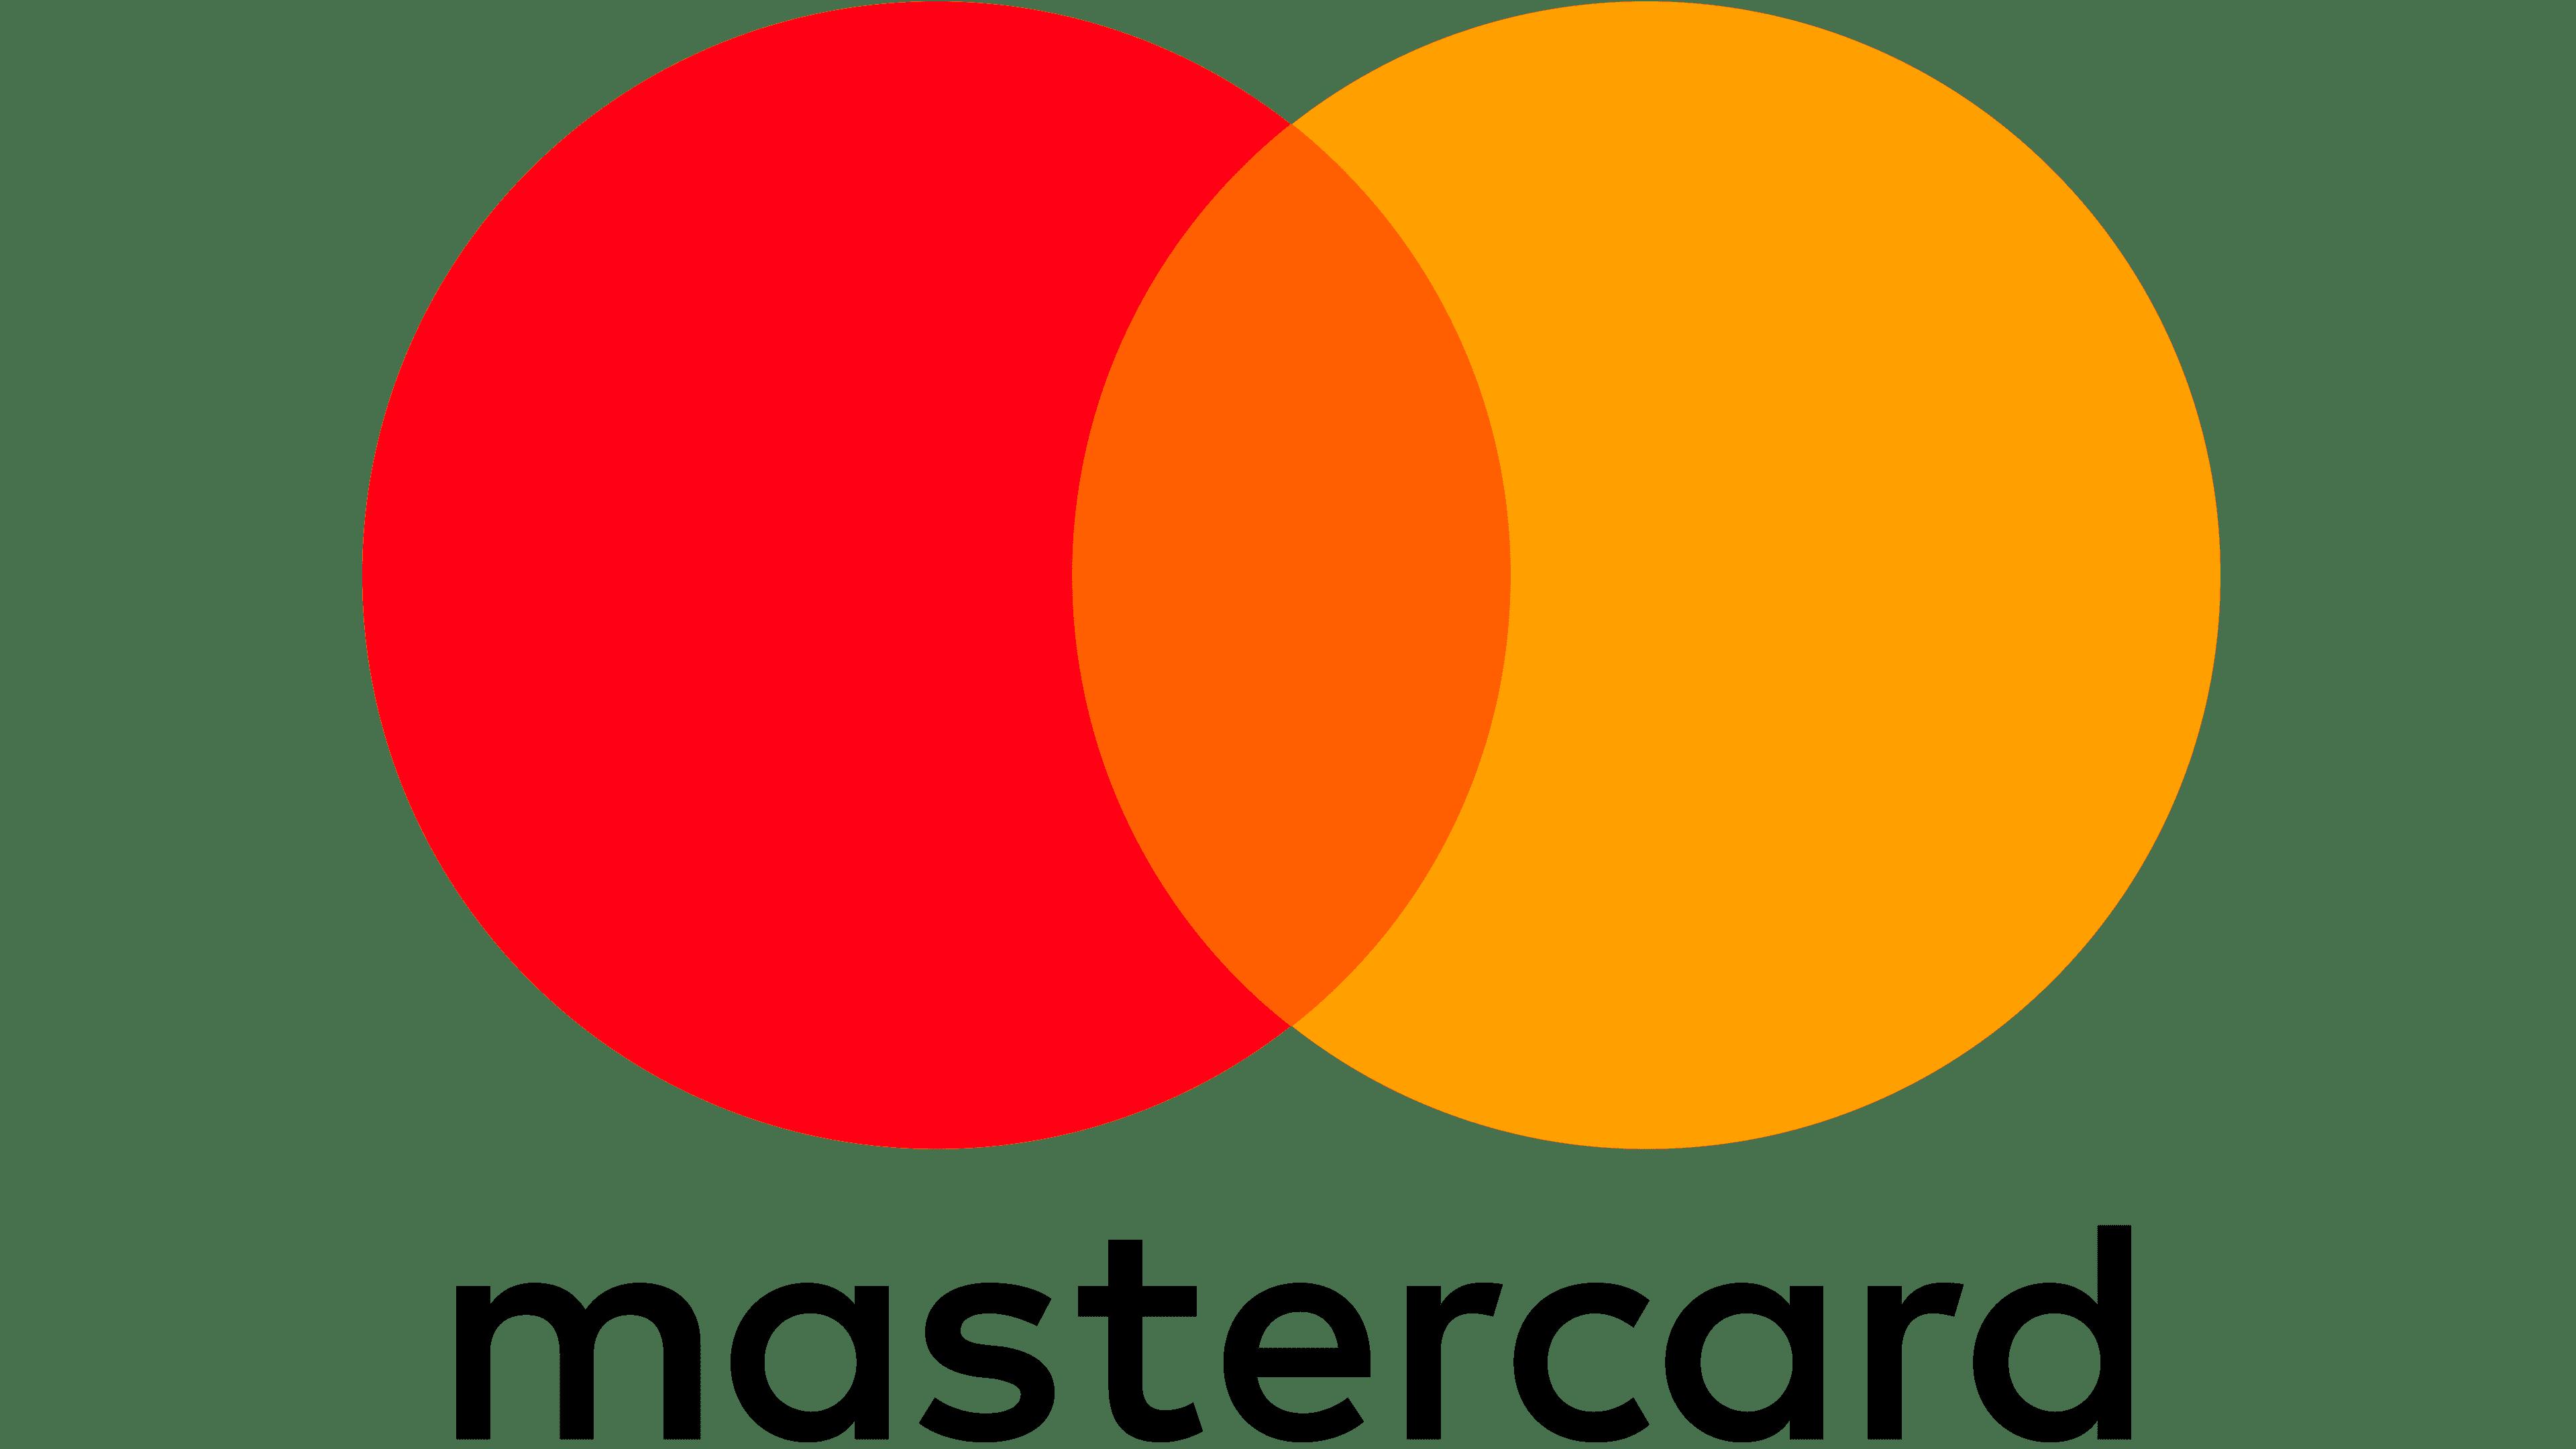 Mastercard Logo, PNG, Symbol, History, Meaning